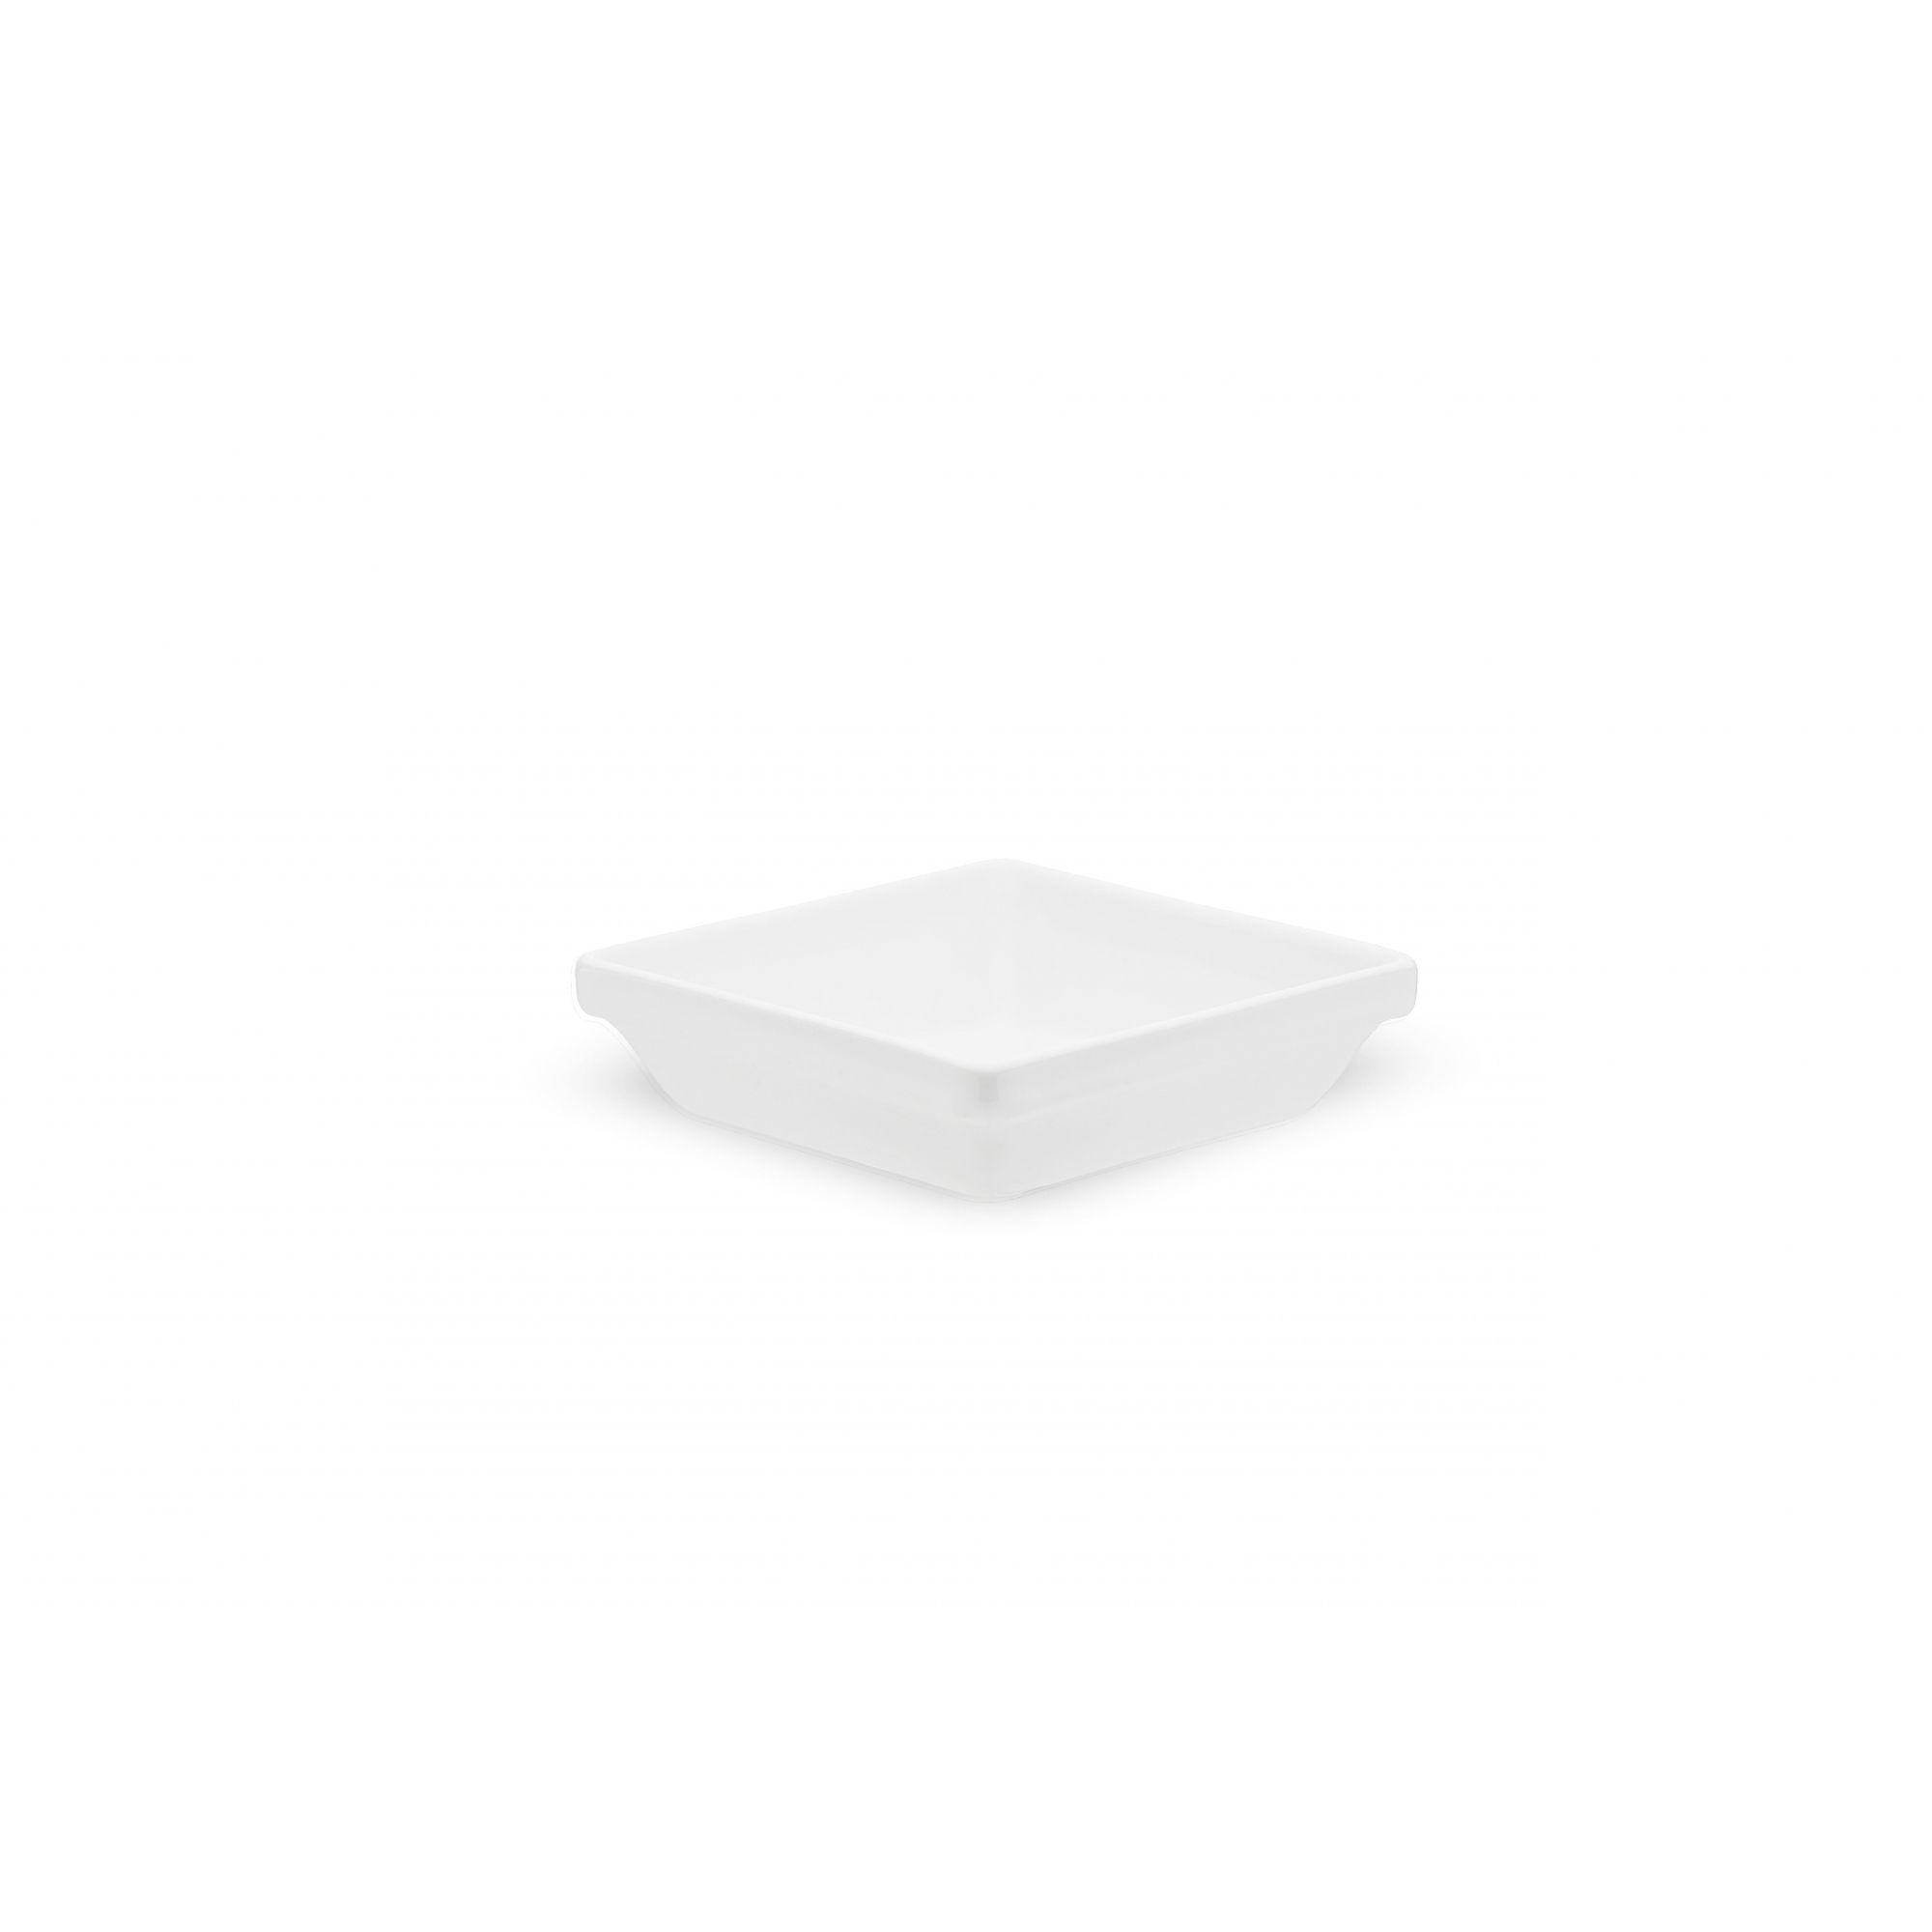 Travessa Porcelana Refratária Empilhável 450 ml Branca